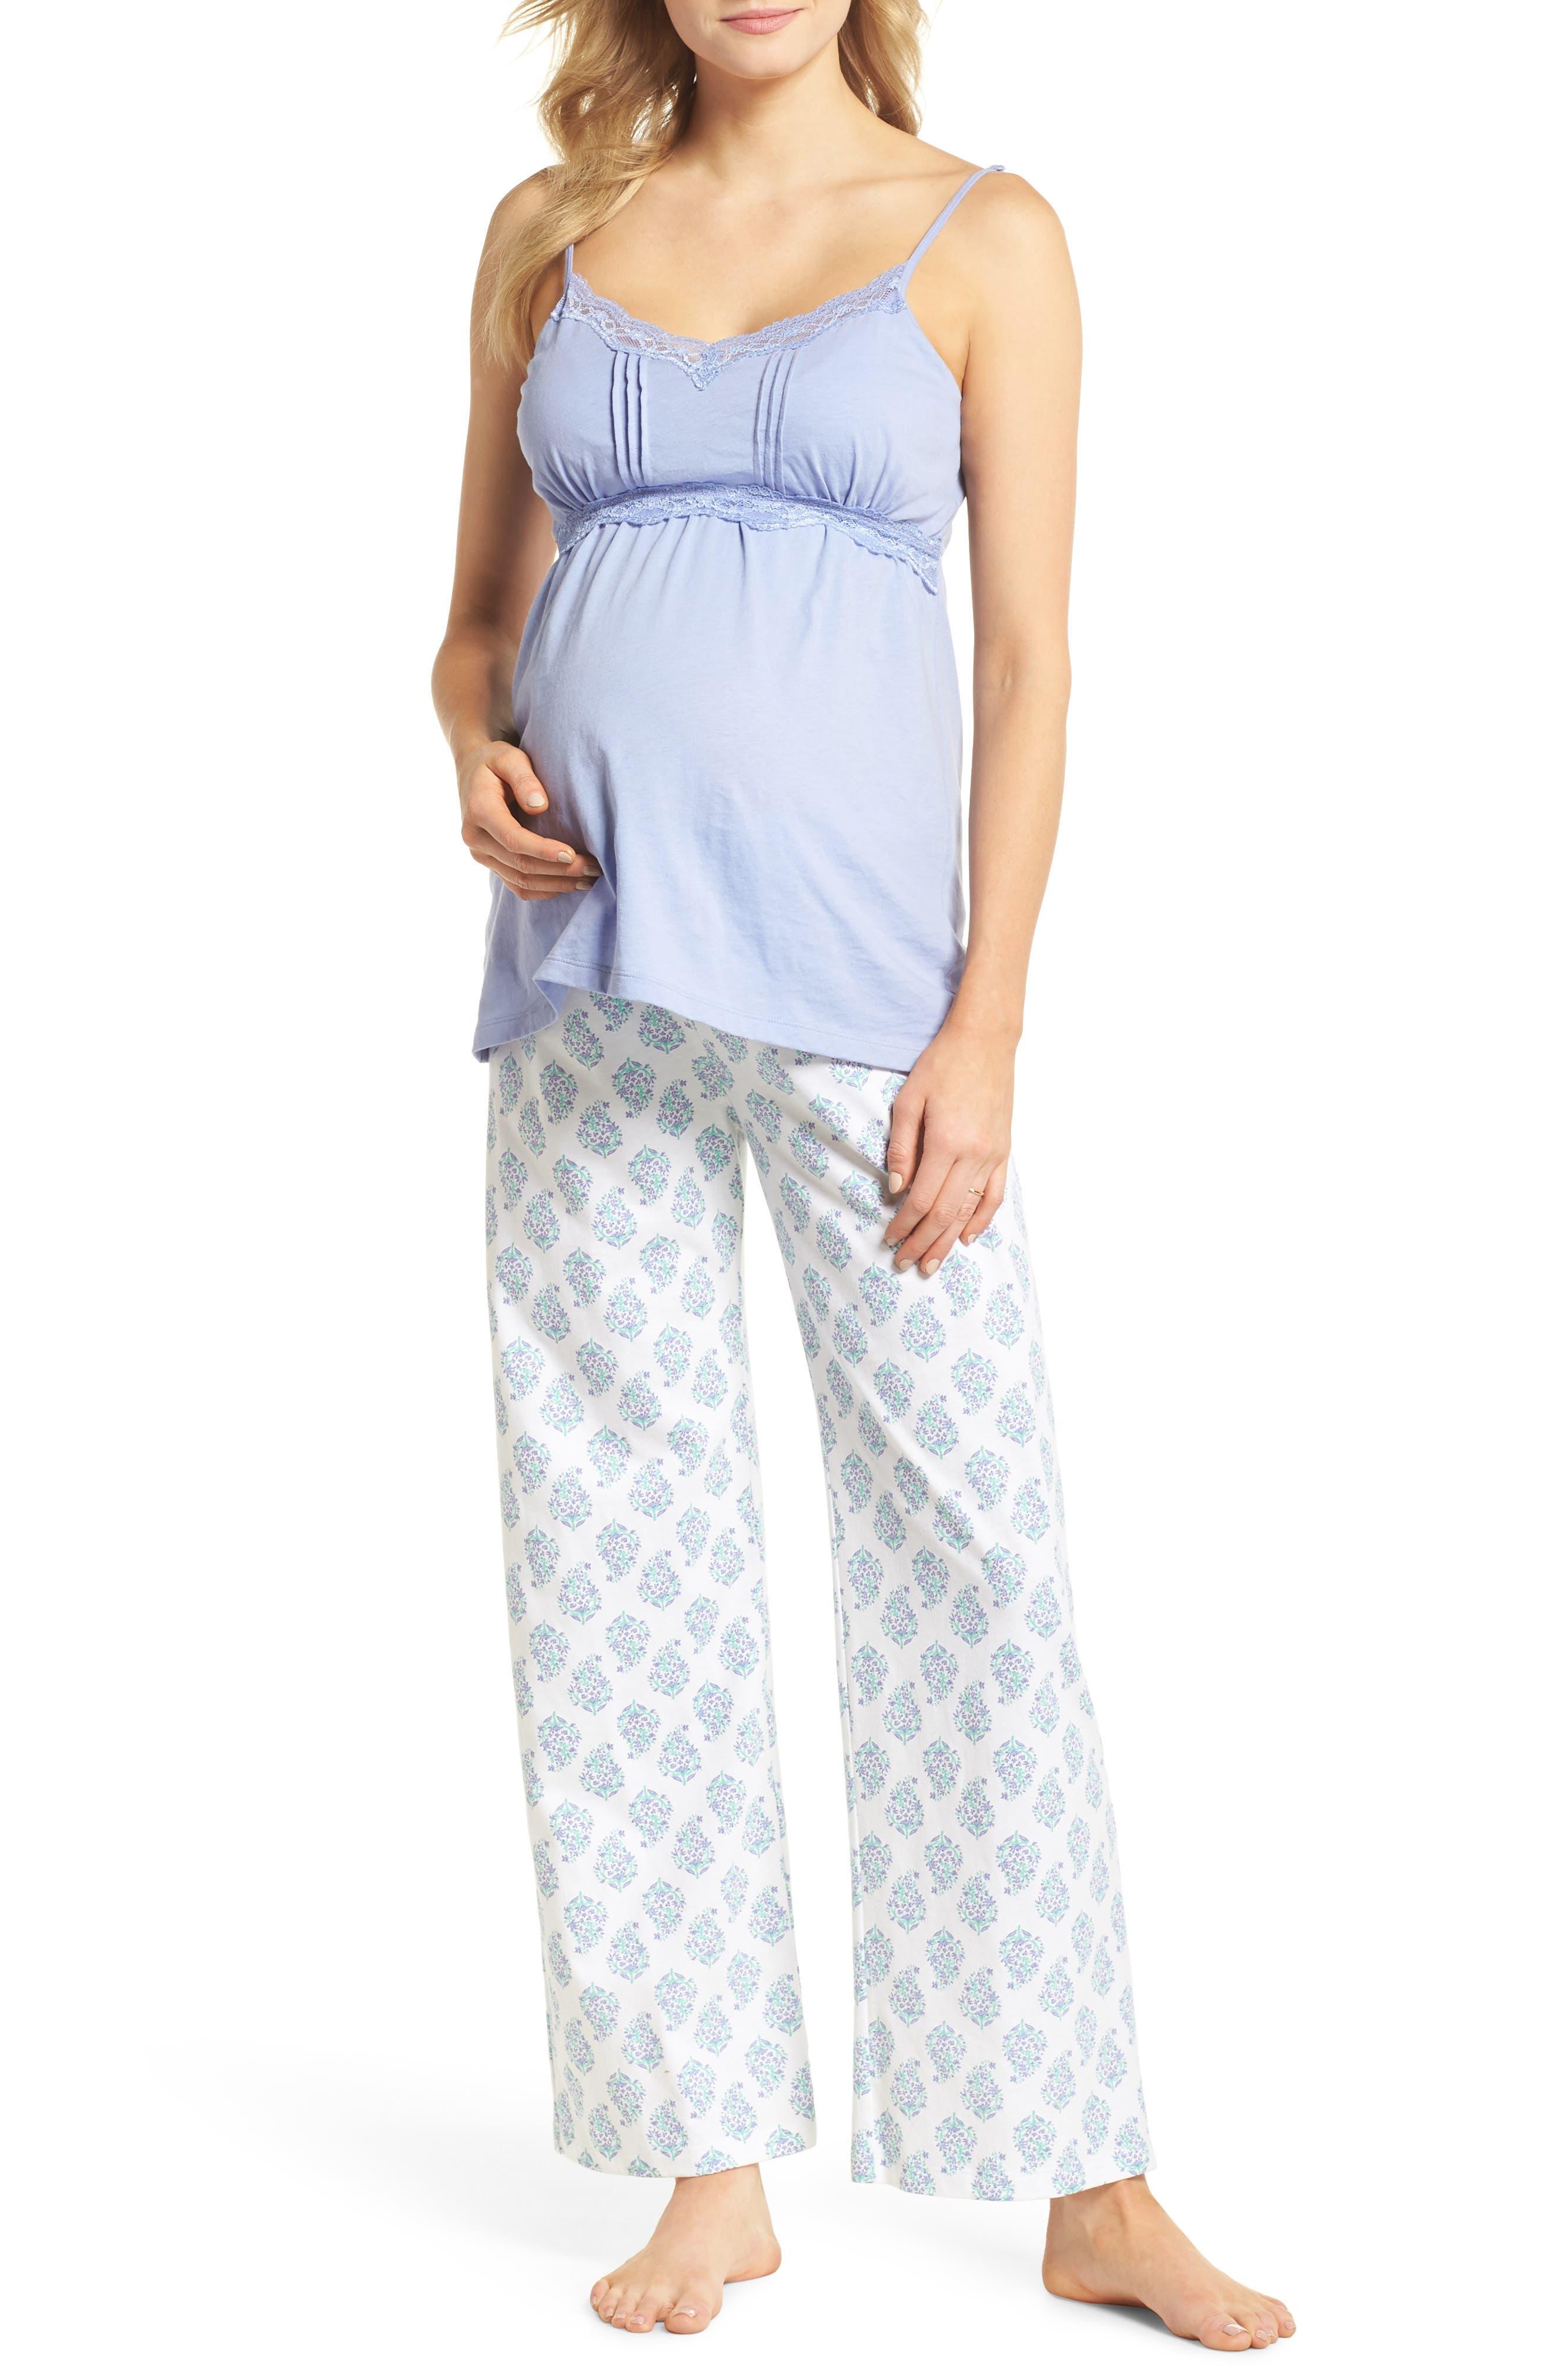 Violette Maternity/Nursing Pajamas,                             Main thumbnail 1, color,                             Indian Print